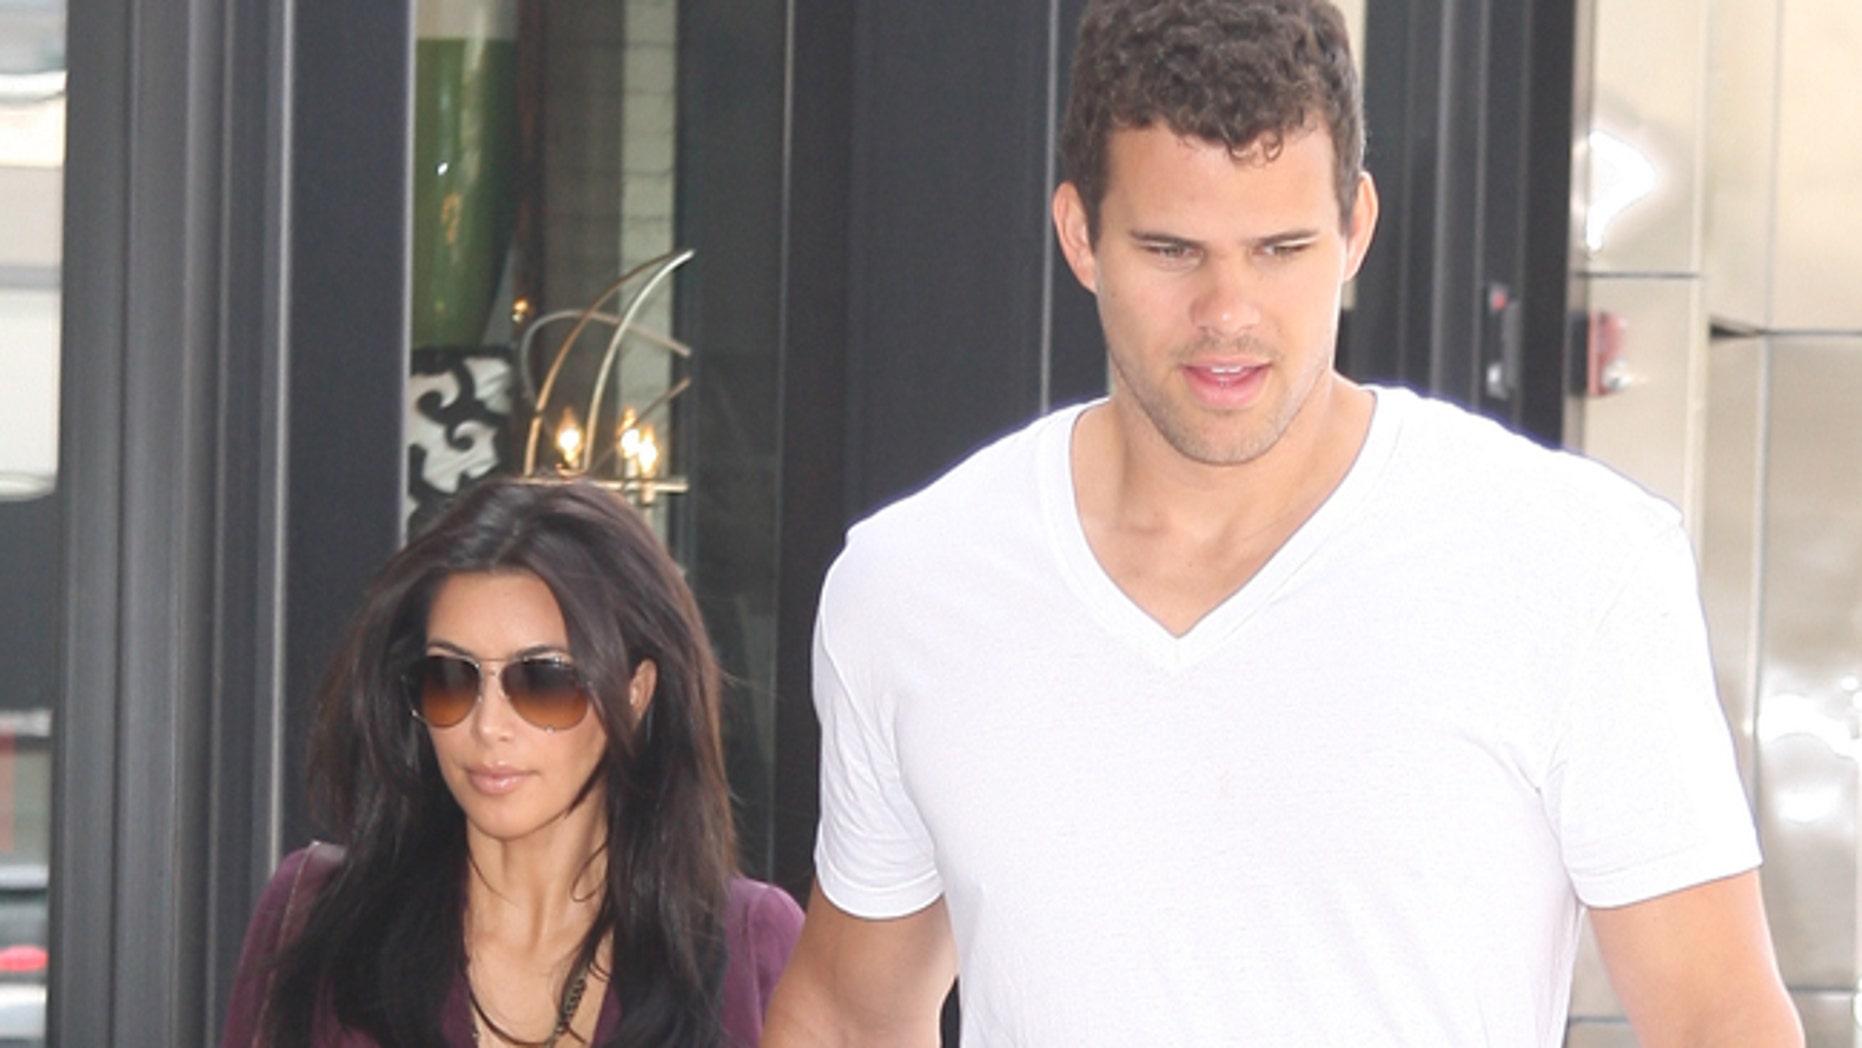 Kim Kardashian and Kris Humphries (X17 Online)